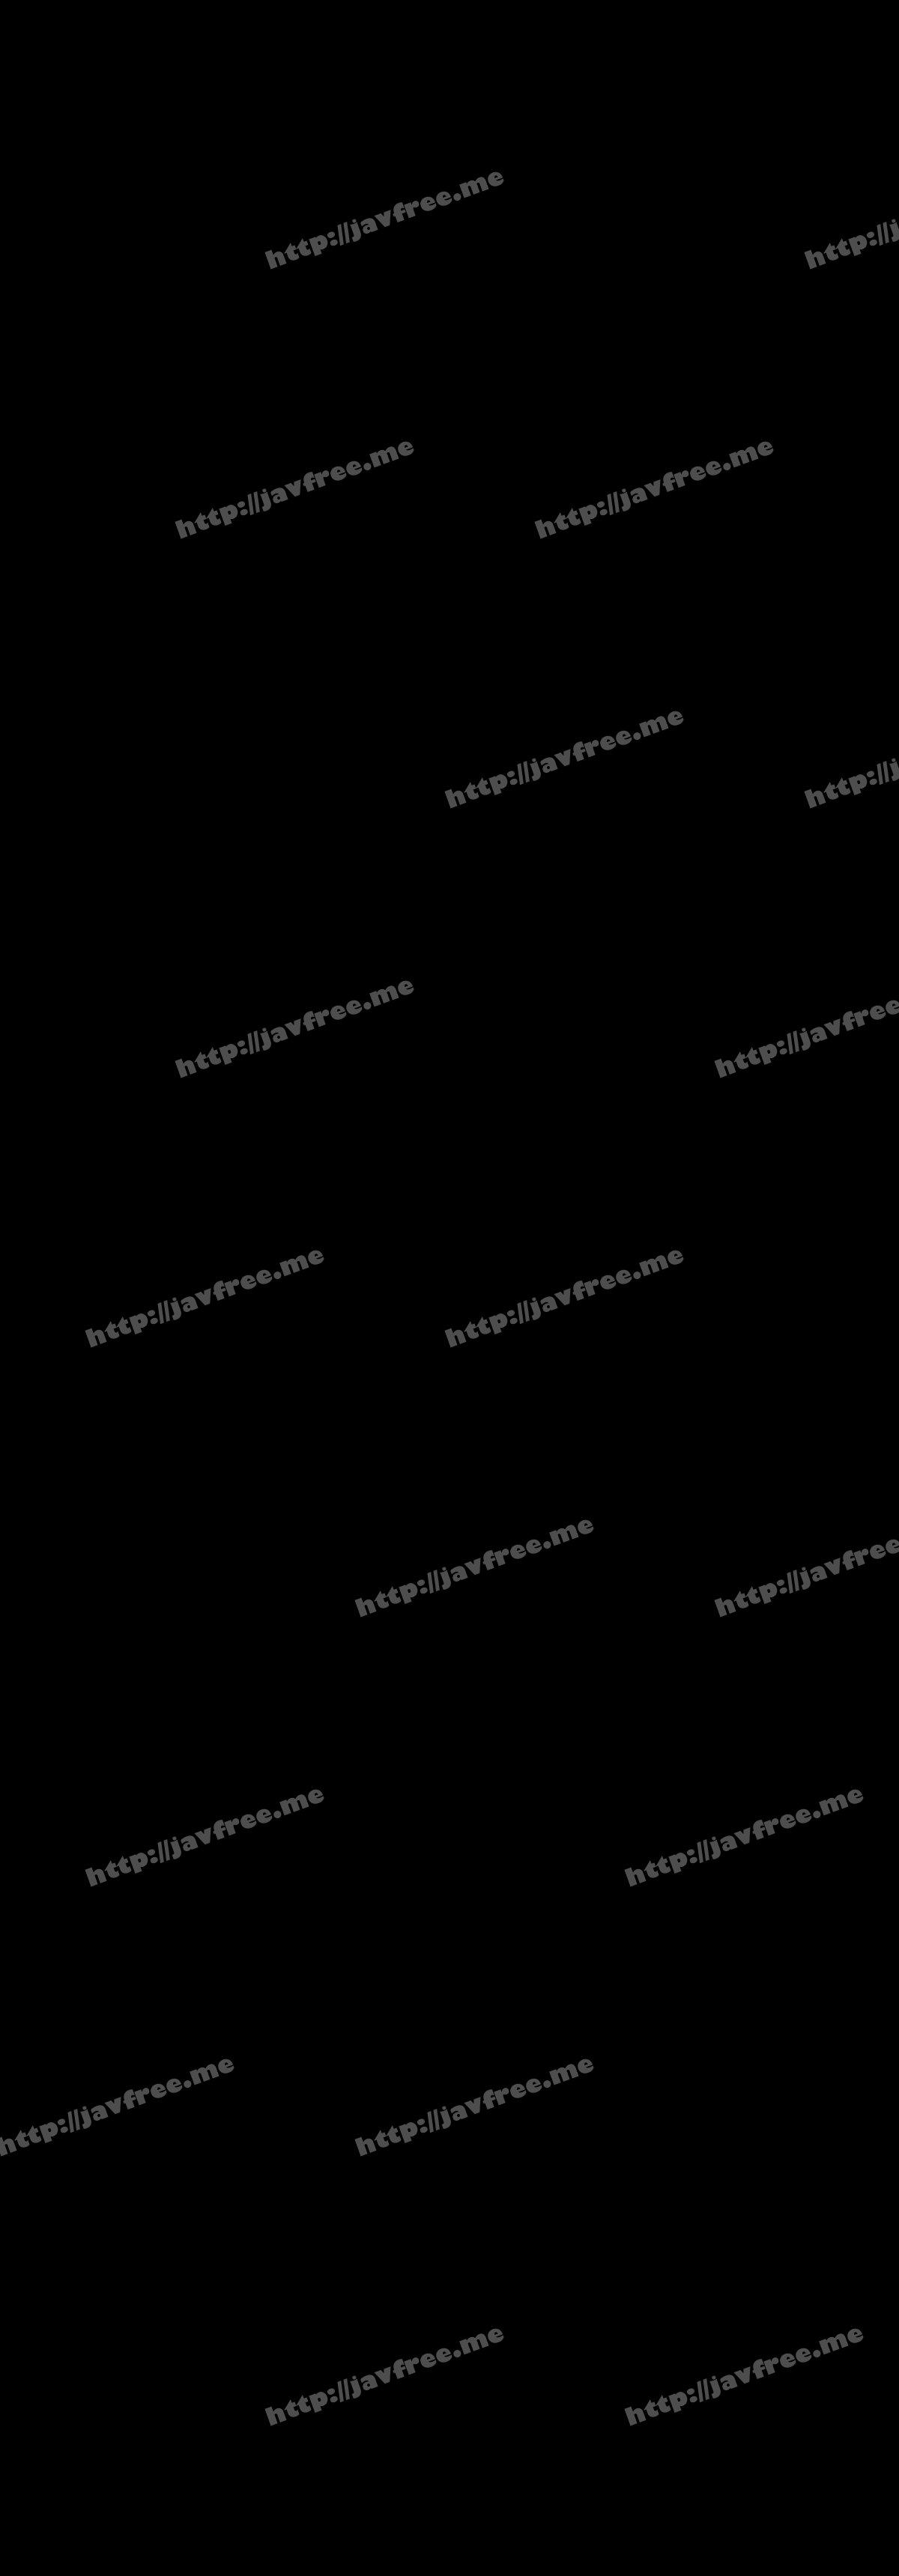 [HD][SPRD-1137] 母と子 もう戻れない息子との関係 柏木舞子 - image SPRD-1137-1080p on https://javfree.me